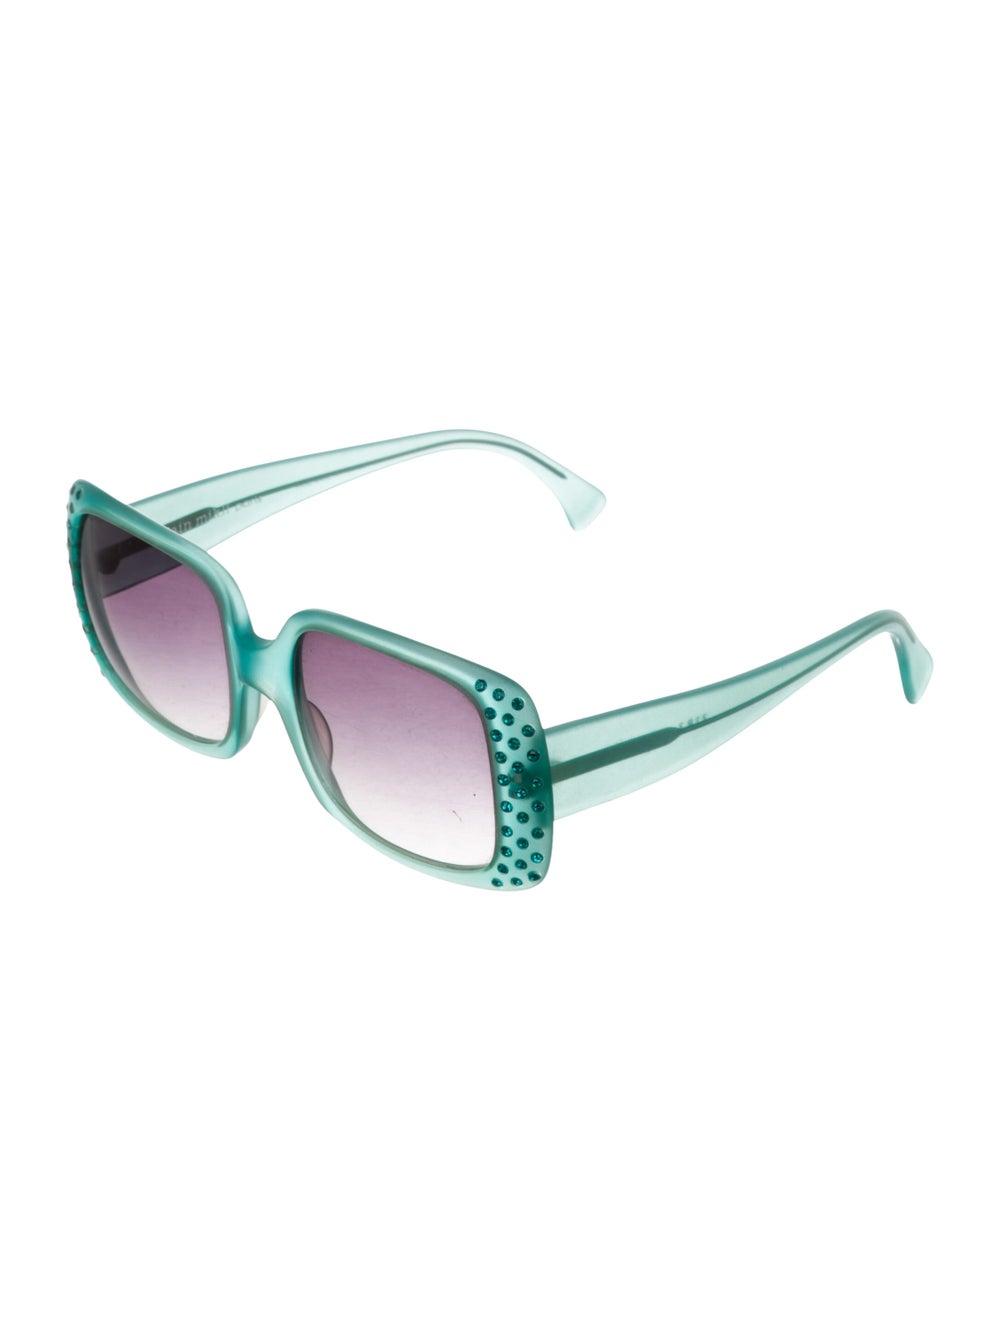 Alain Mikli Oversize Tinted Sunglasses Green - image 2